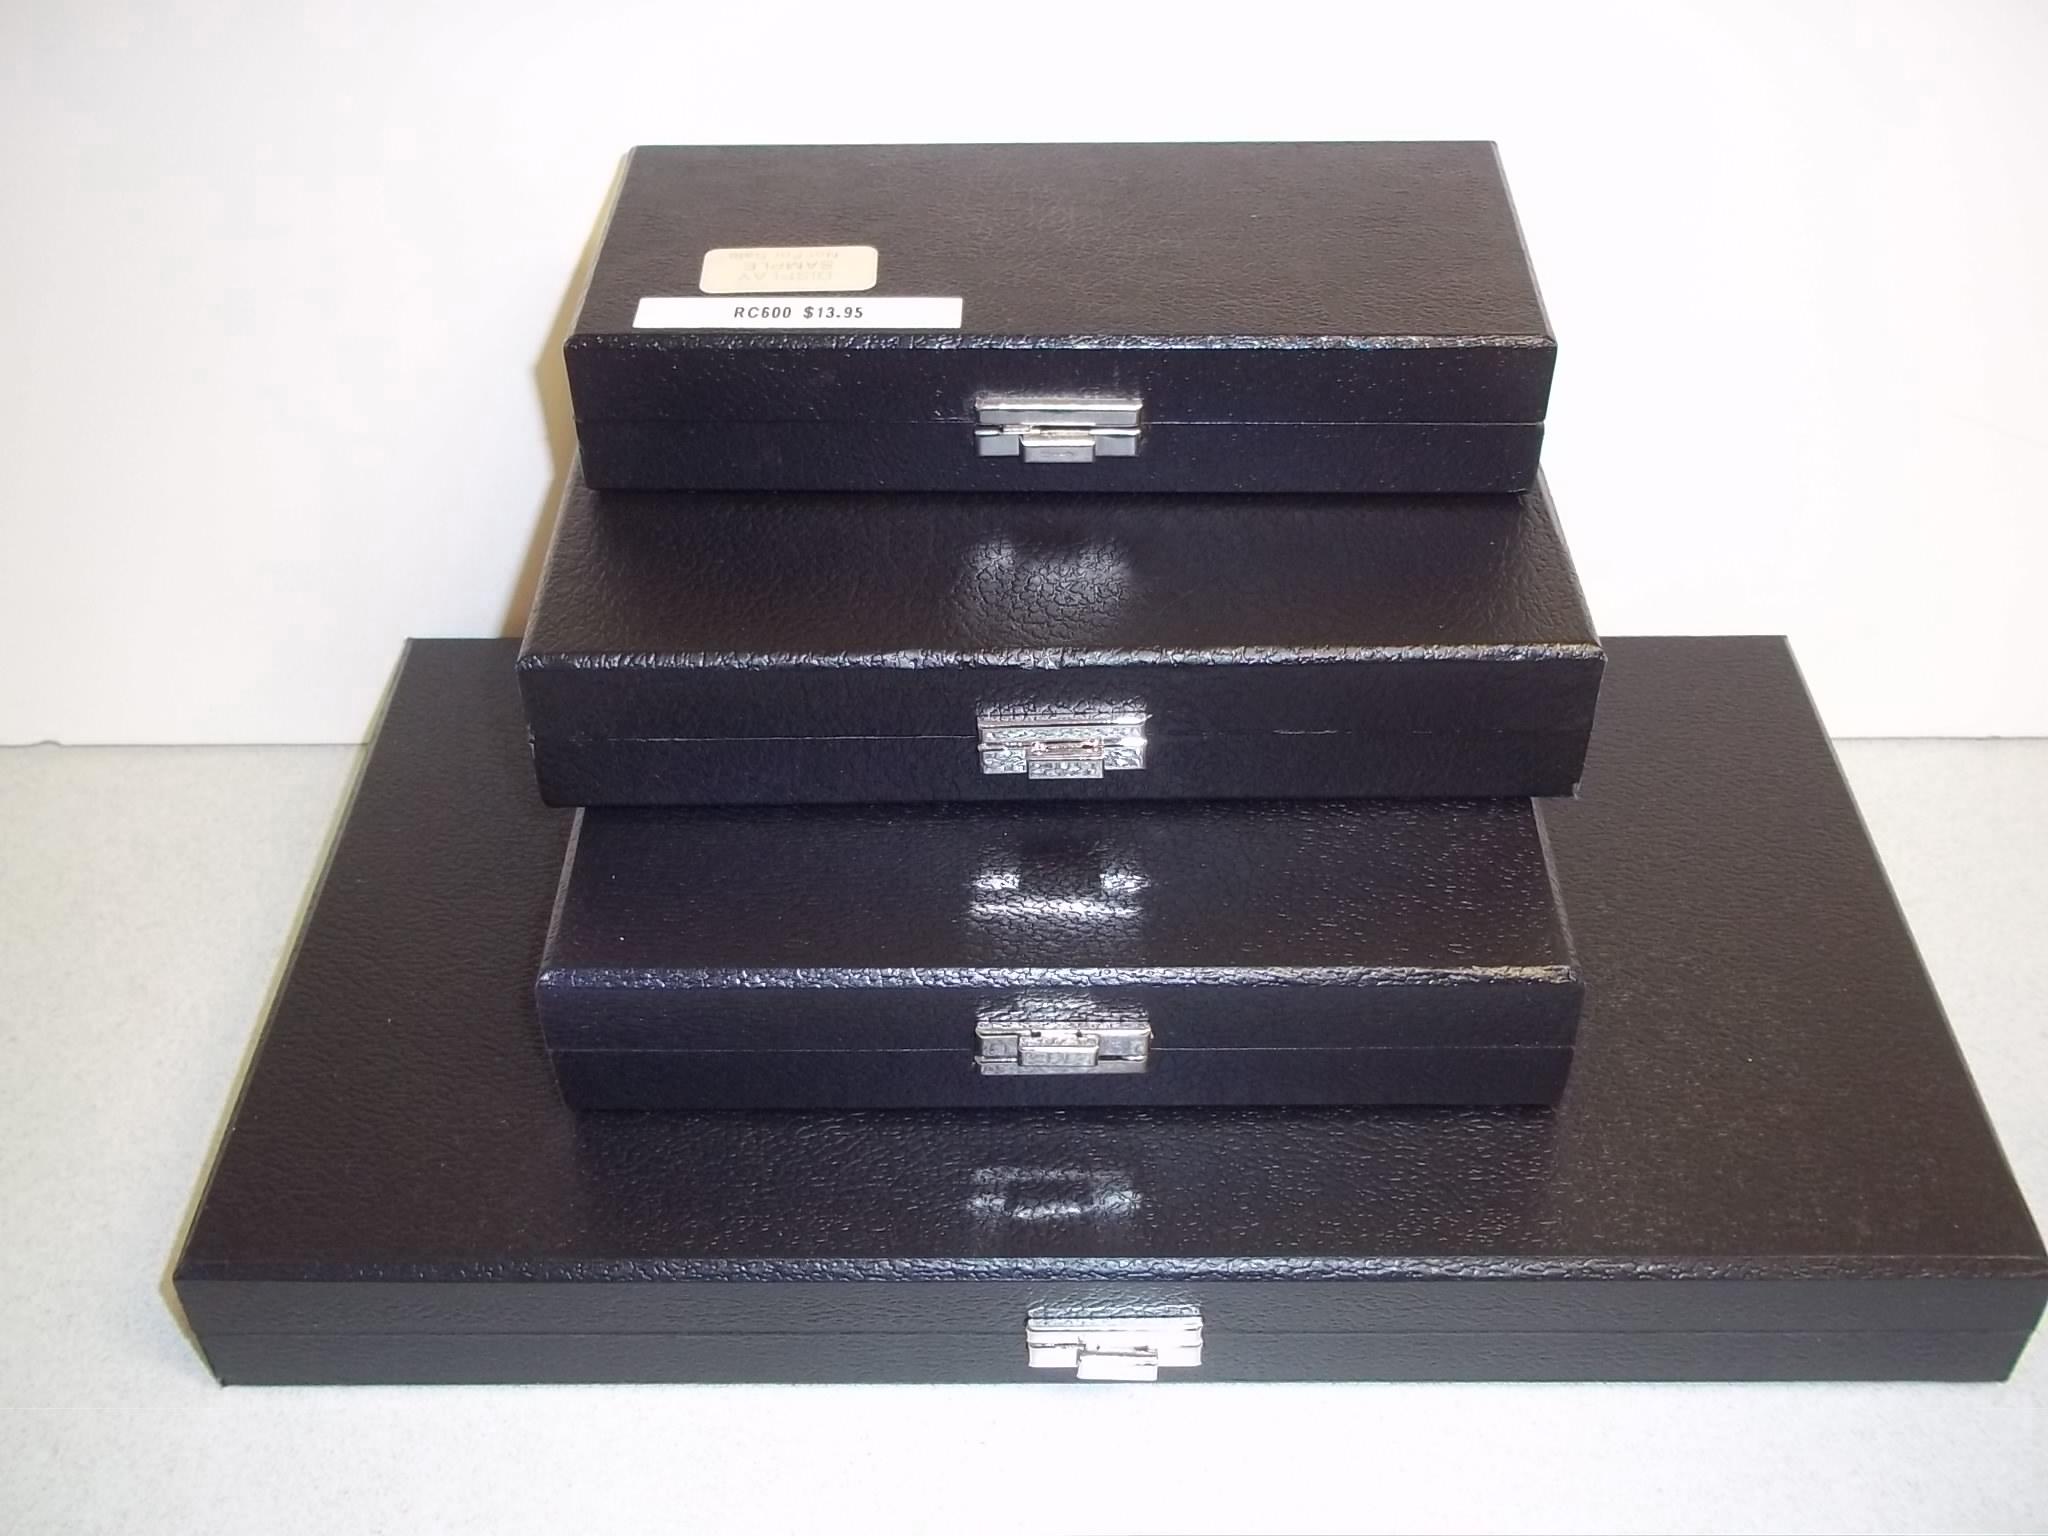 RC600 Ring Display Case--12 Slot